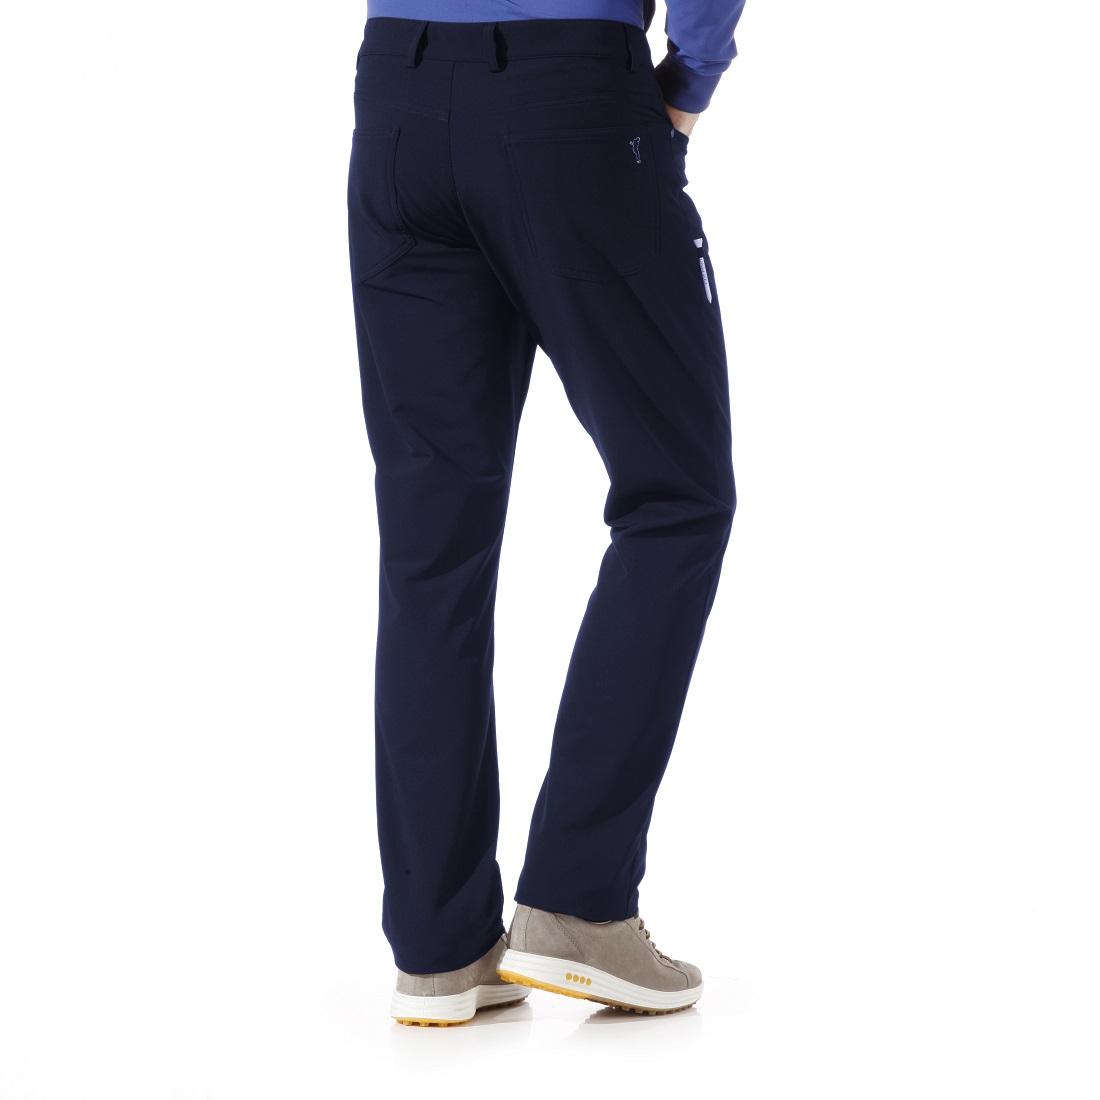 5-Pocket 4-Way Stretch-Hosen